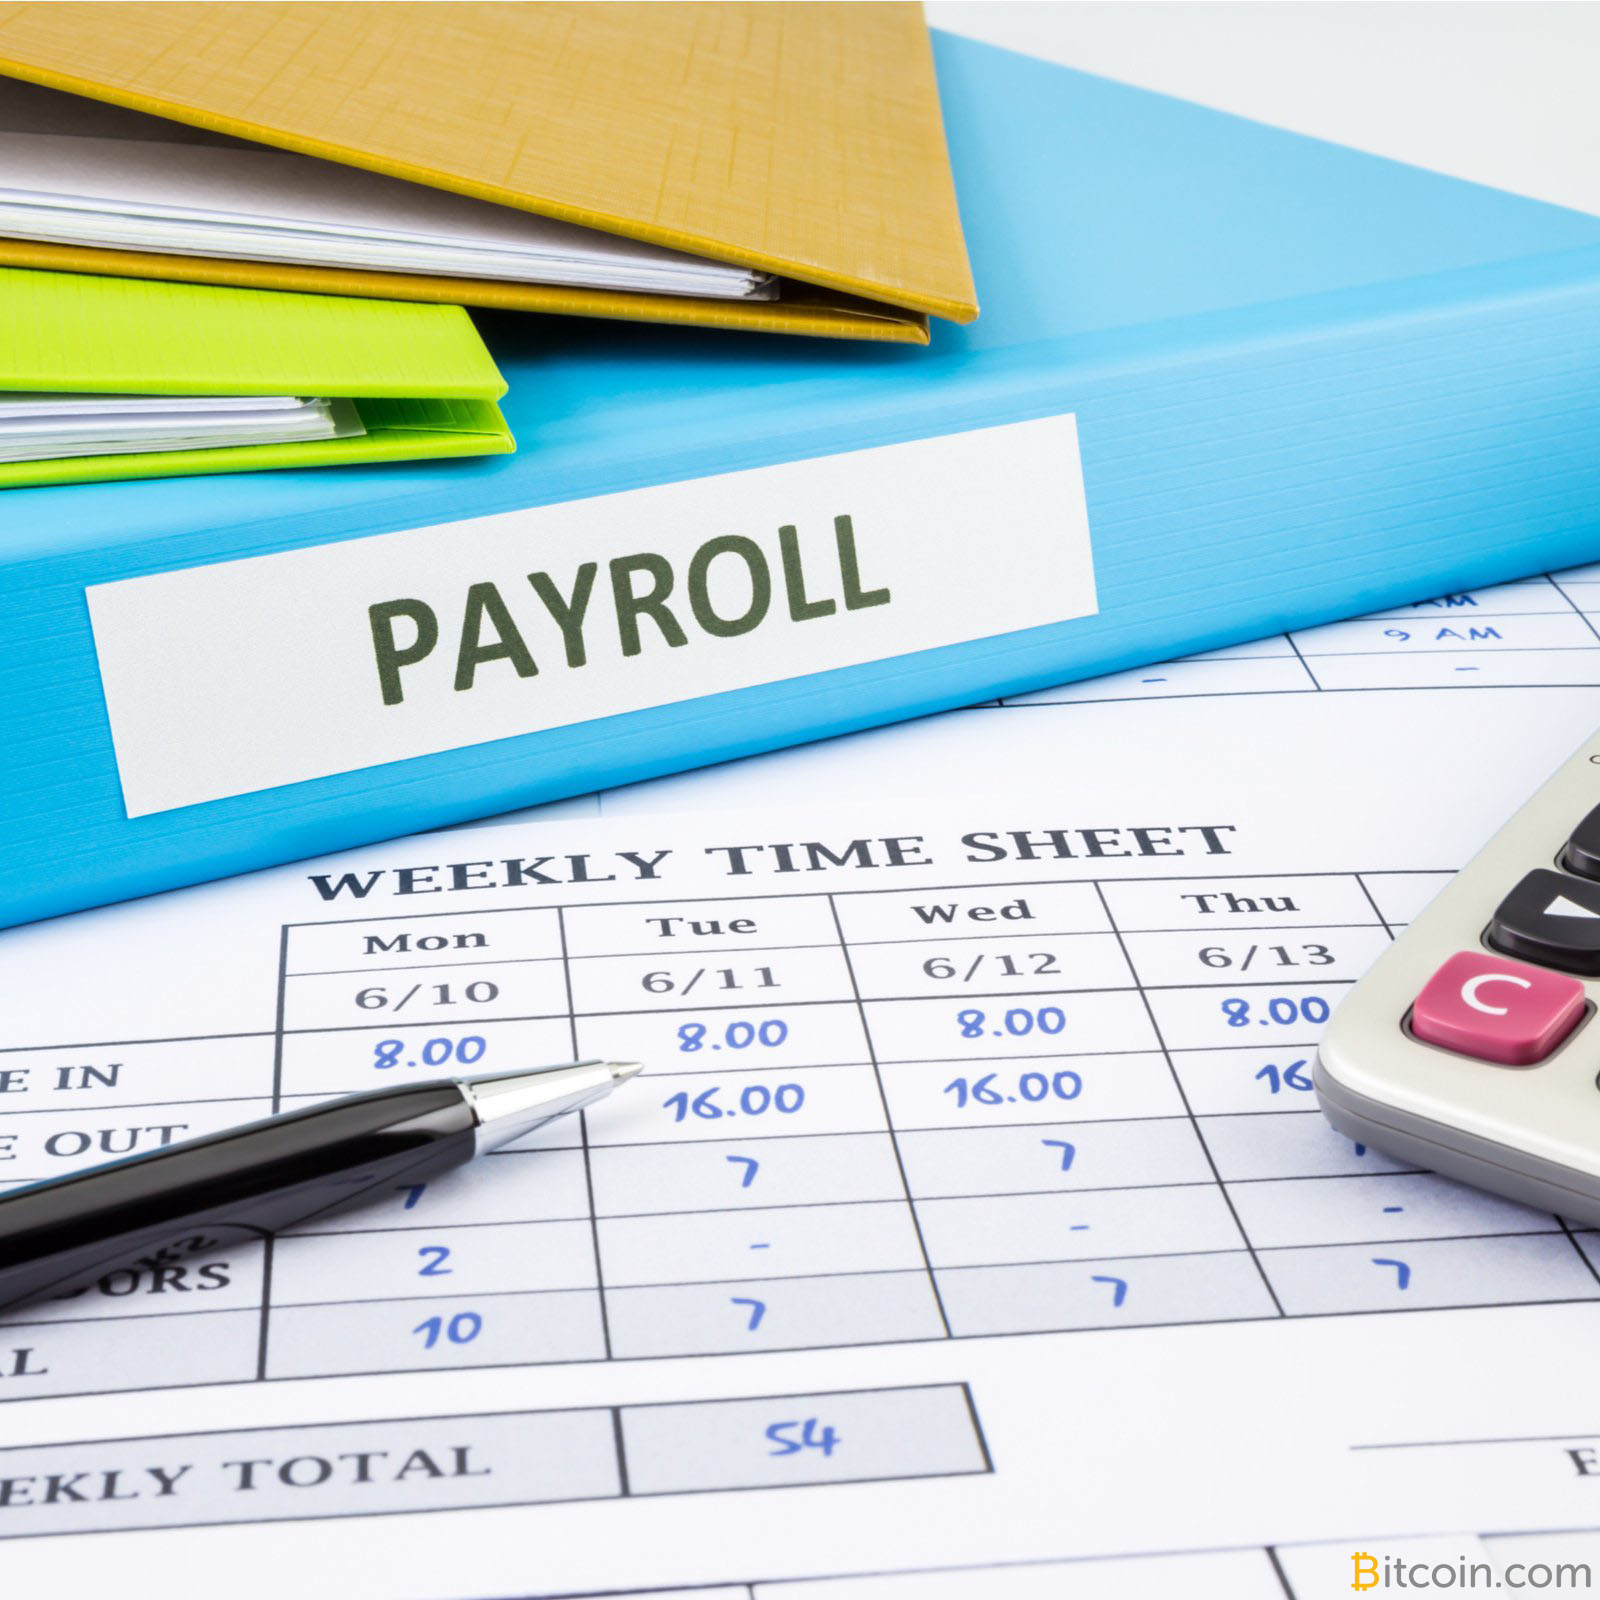 payroll - ICO ImWage: una nuova gestione delle buste paga targata Bitwage